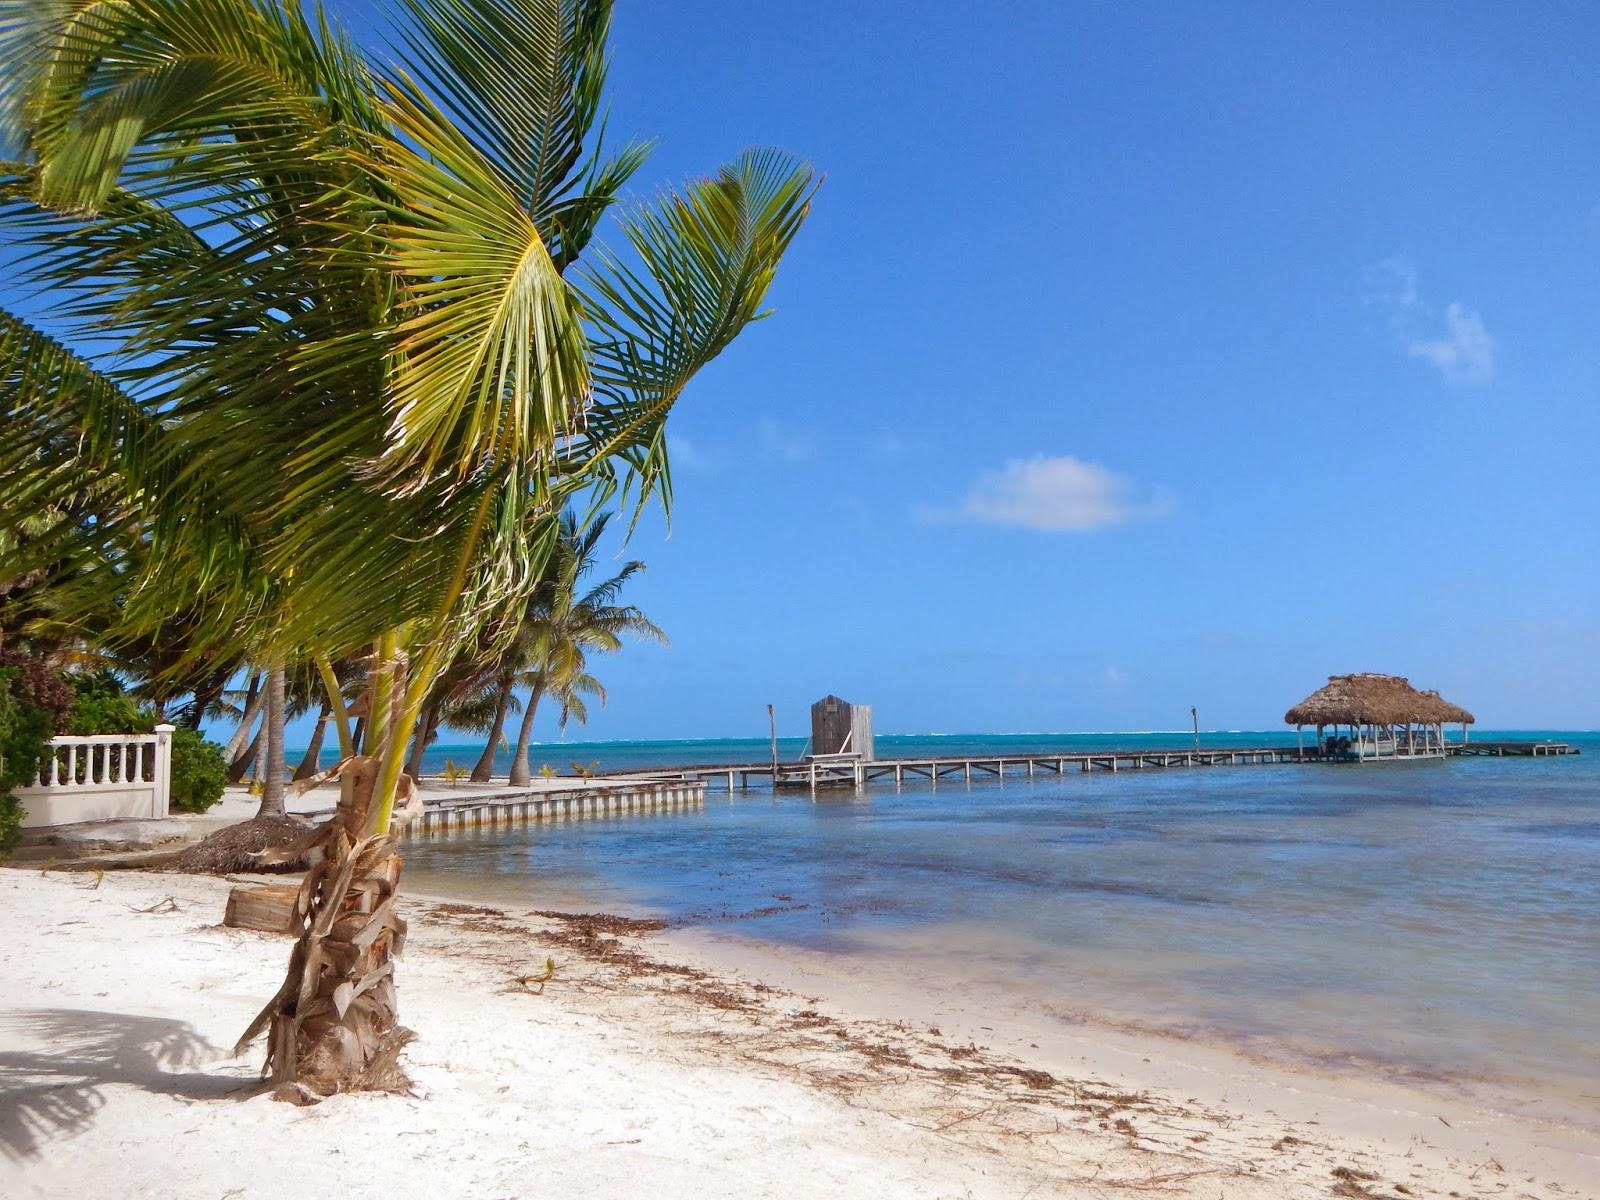 23 Reasons Why I Love San Pedro Belize